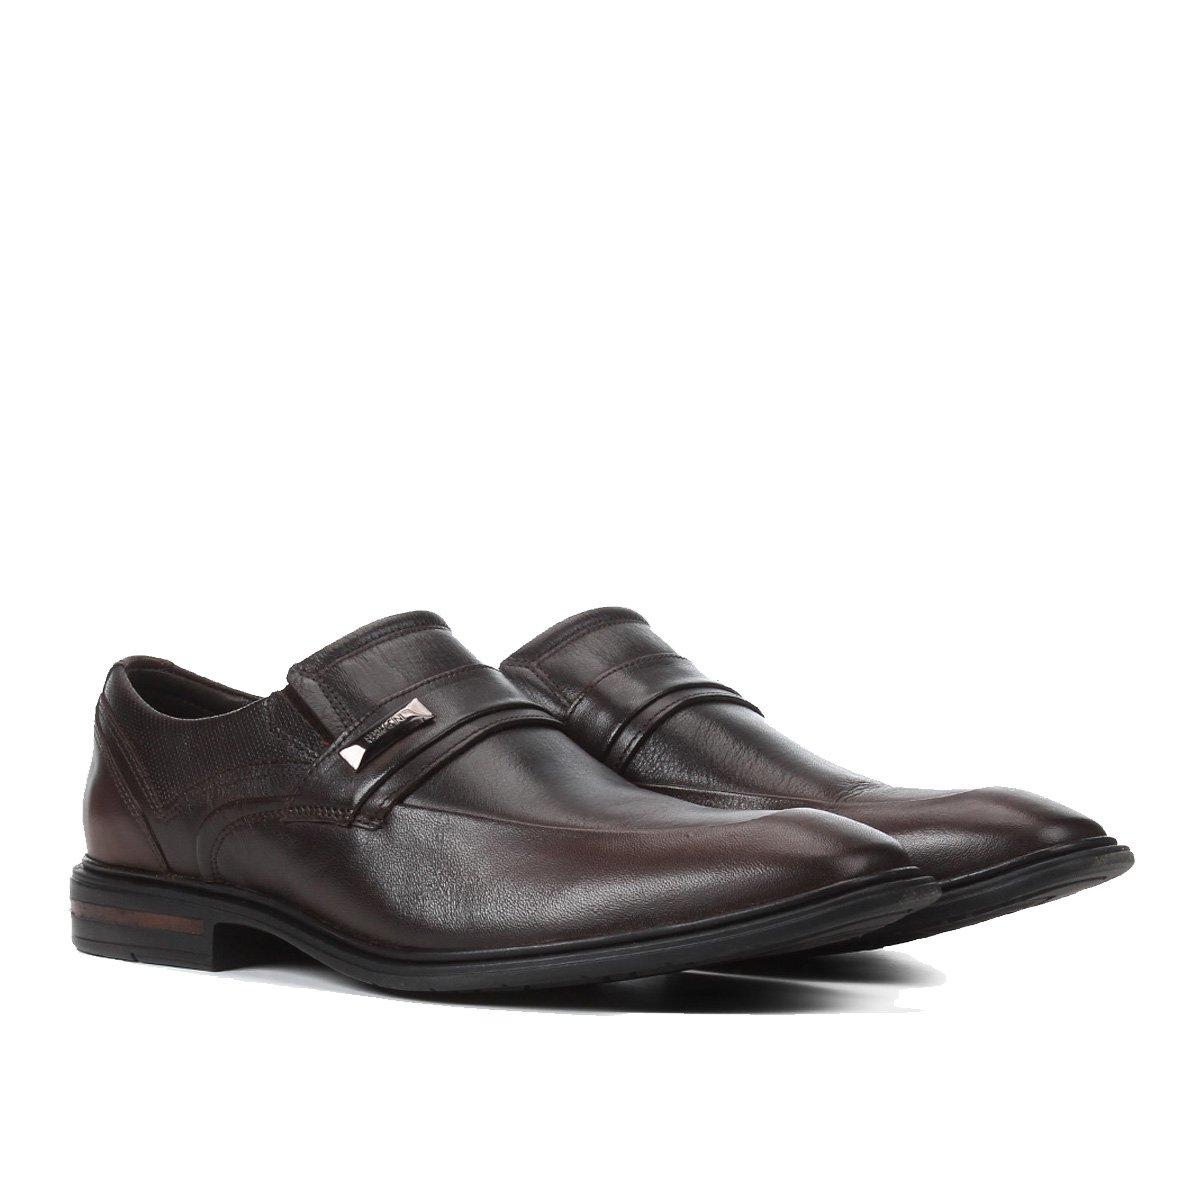 Sapato Social Couro Ferracini Londres I